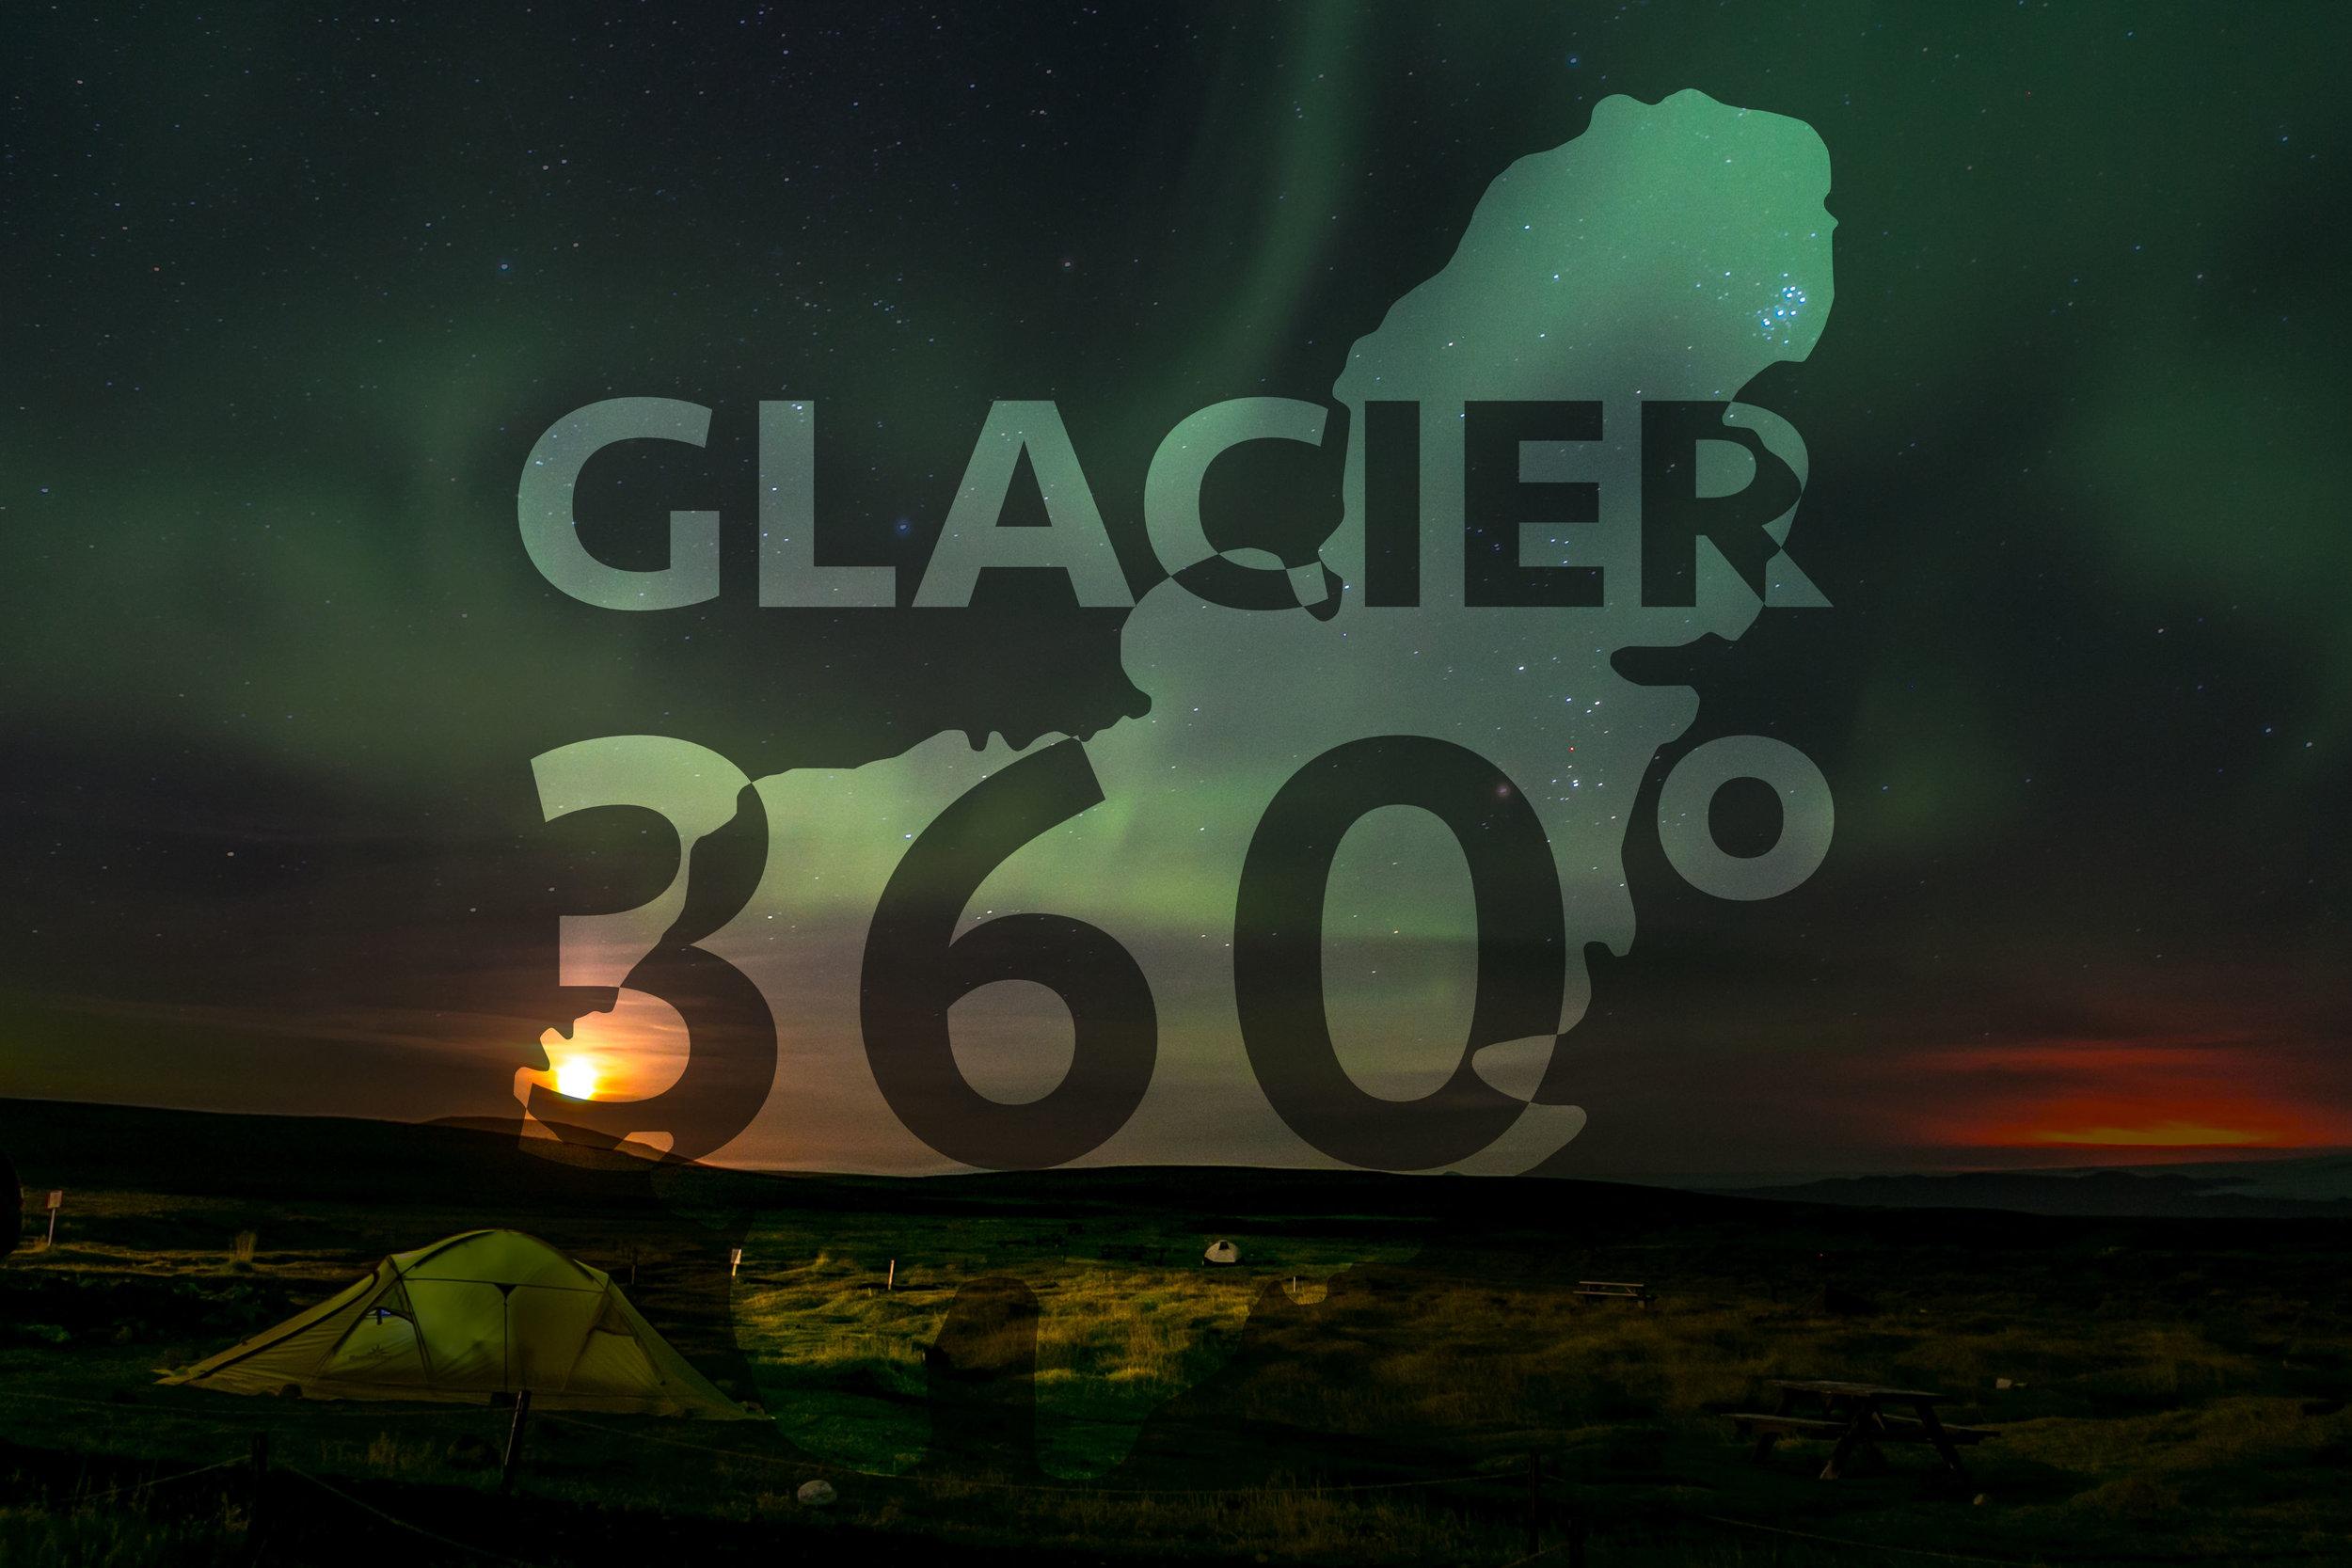 Glacier 360 logo overlay IMG_2581.jpg